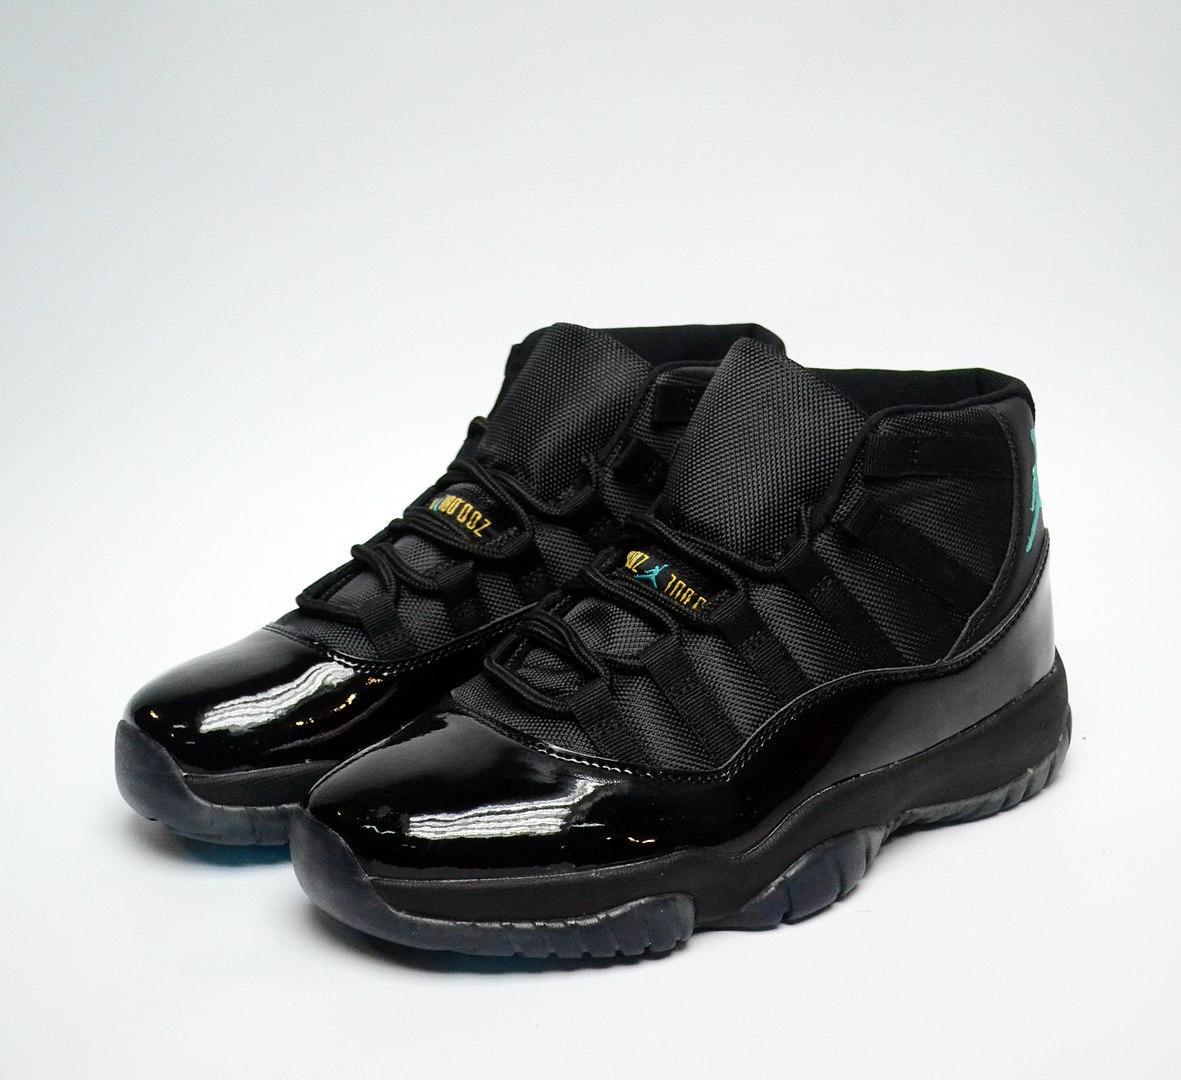 Мужские кроссовки Nike Air Jordan XI, Копия